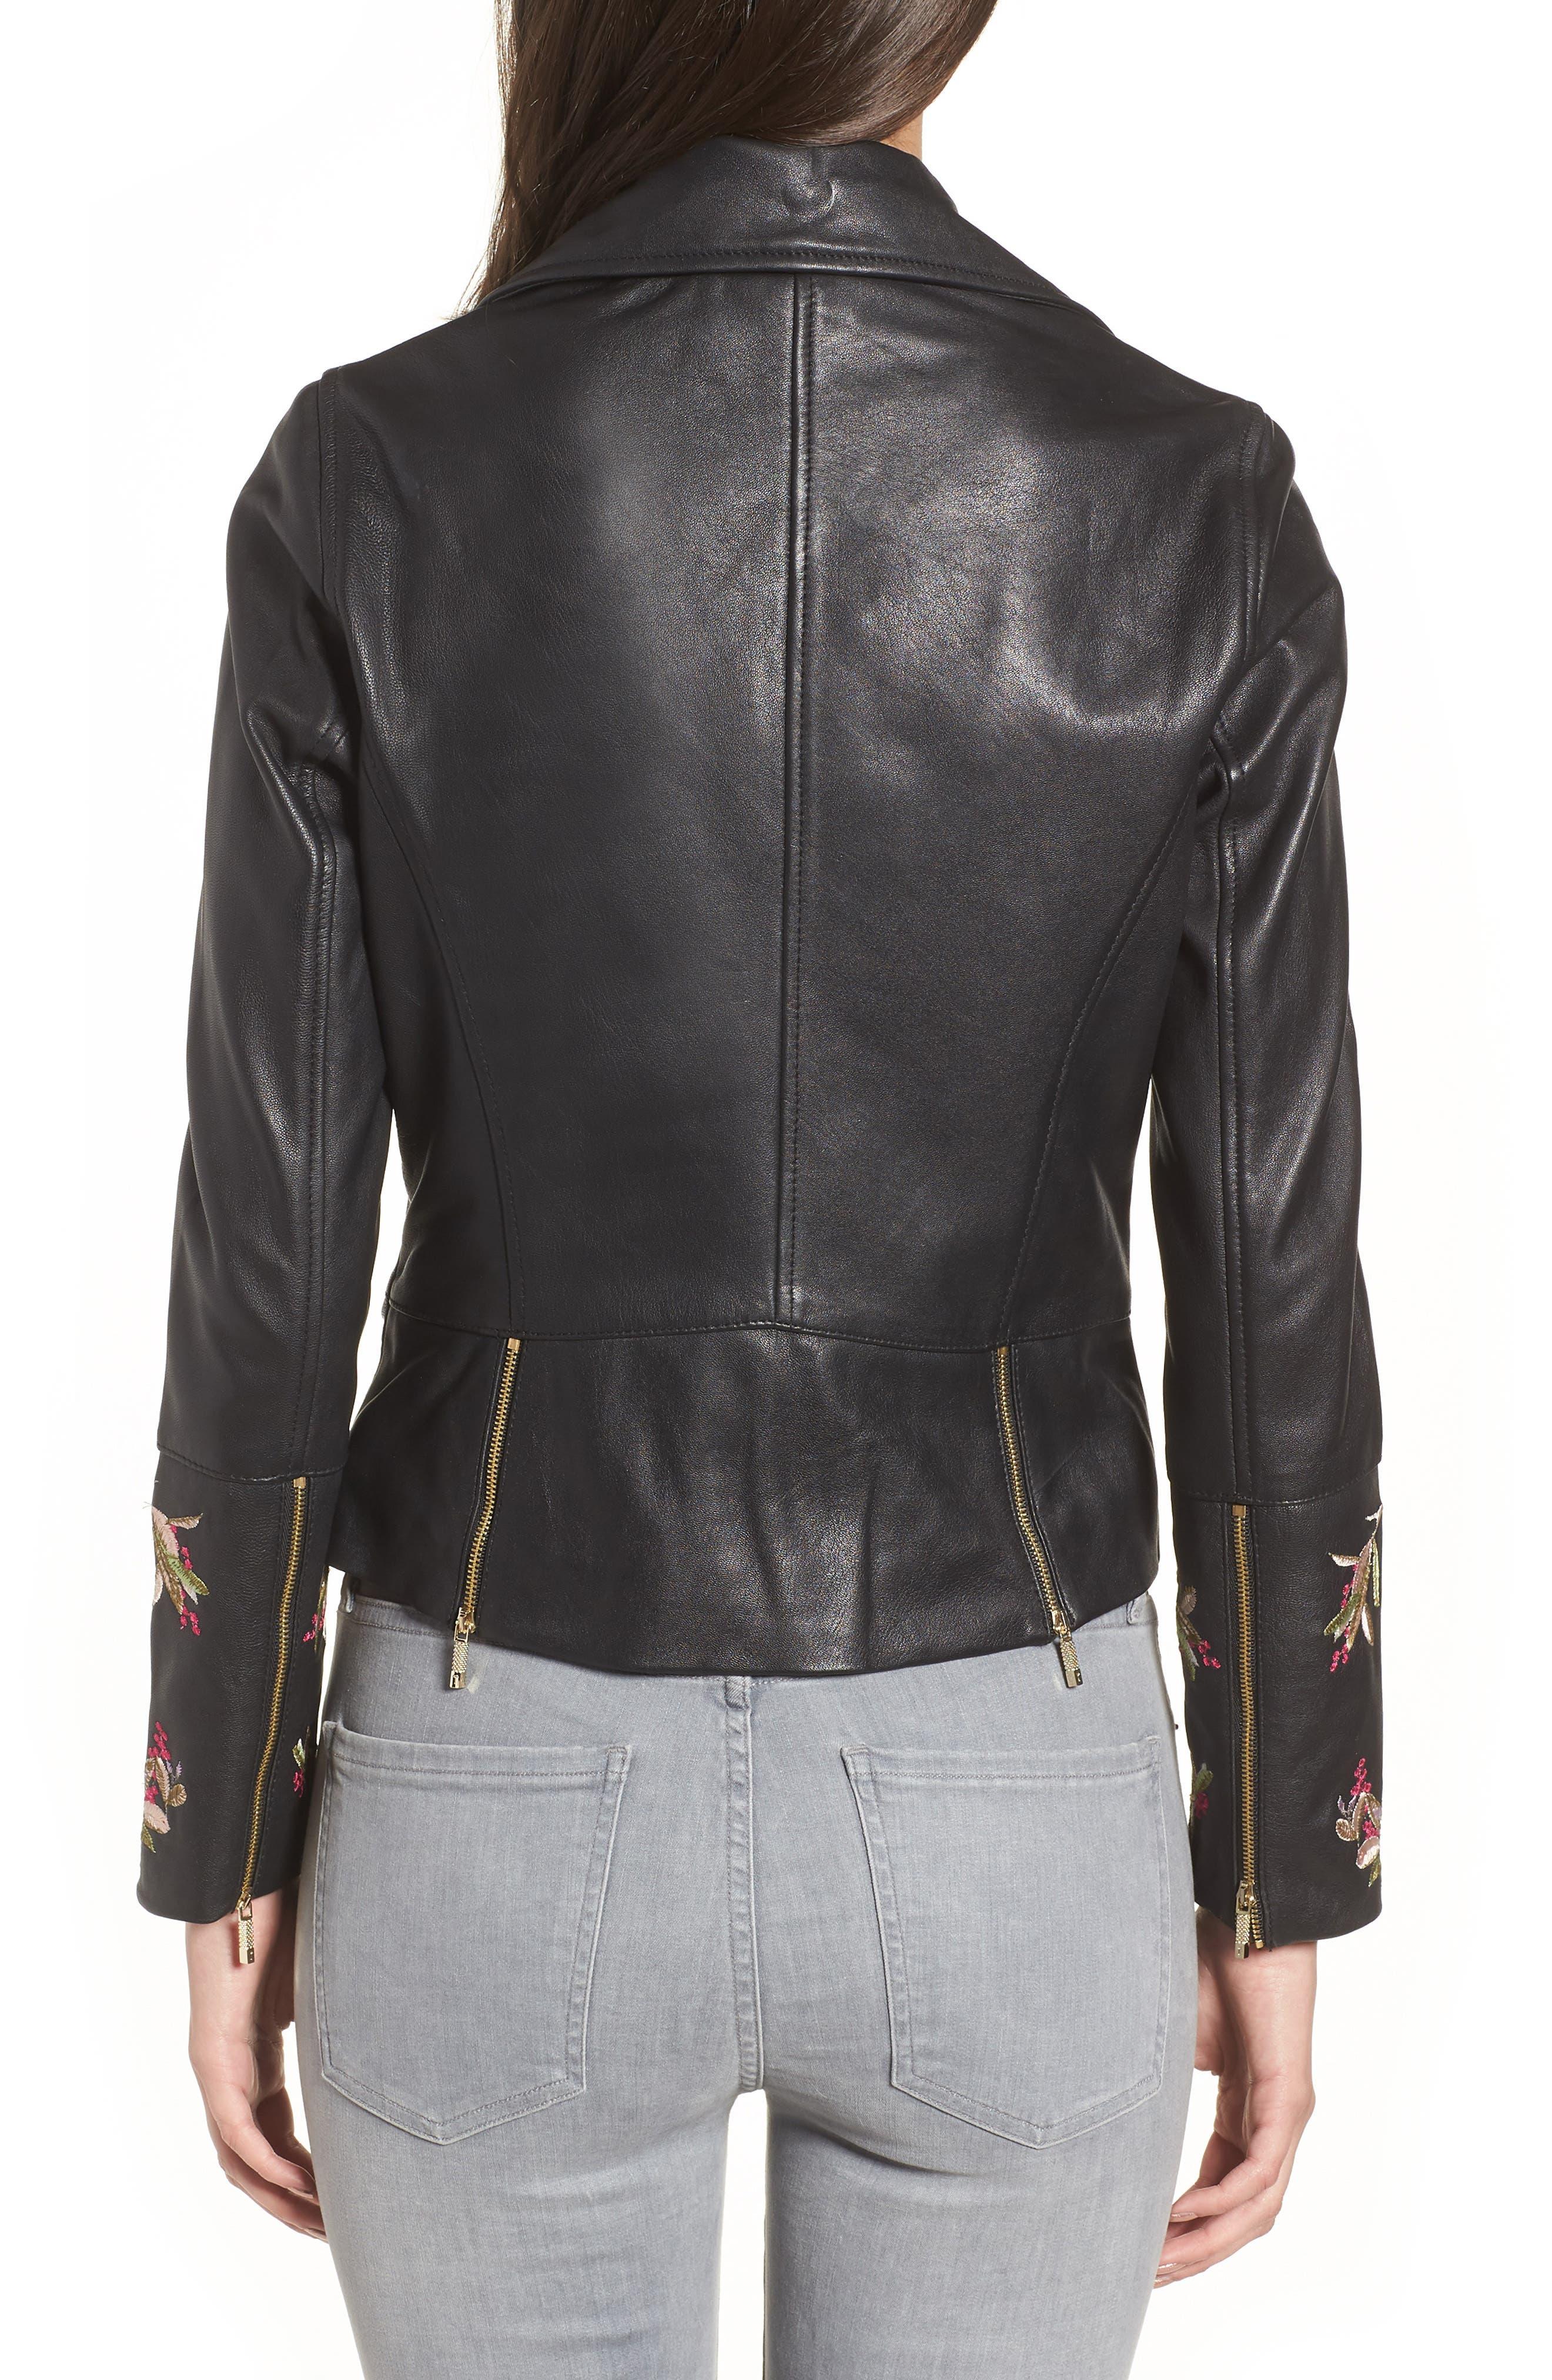 Highgrove Leather BIker Jacket,                             Alternate thumbnail 2, color,                             Black